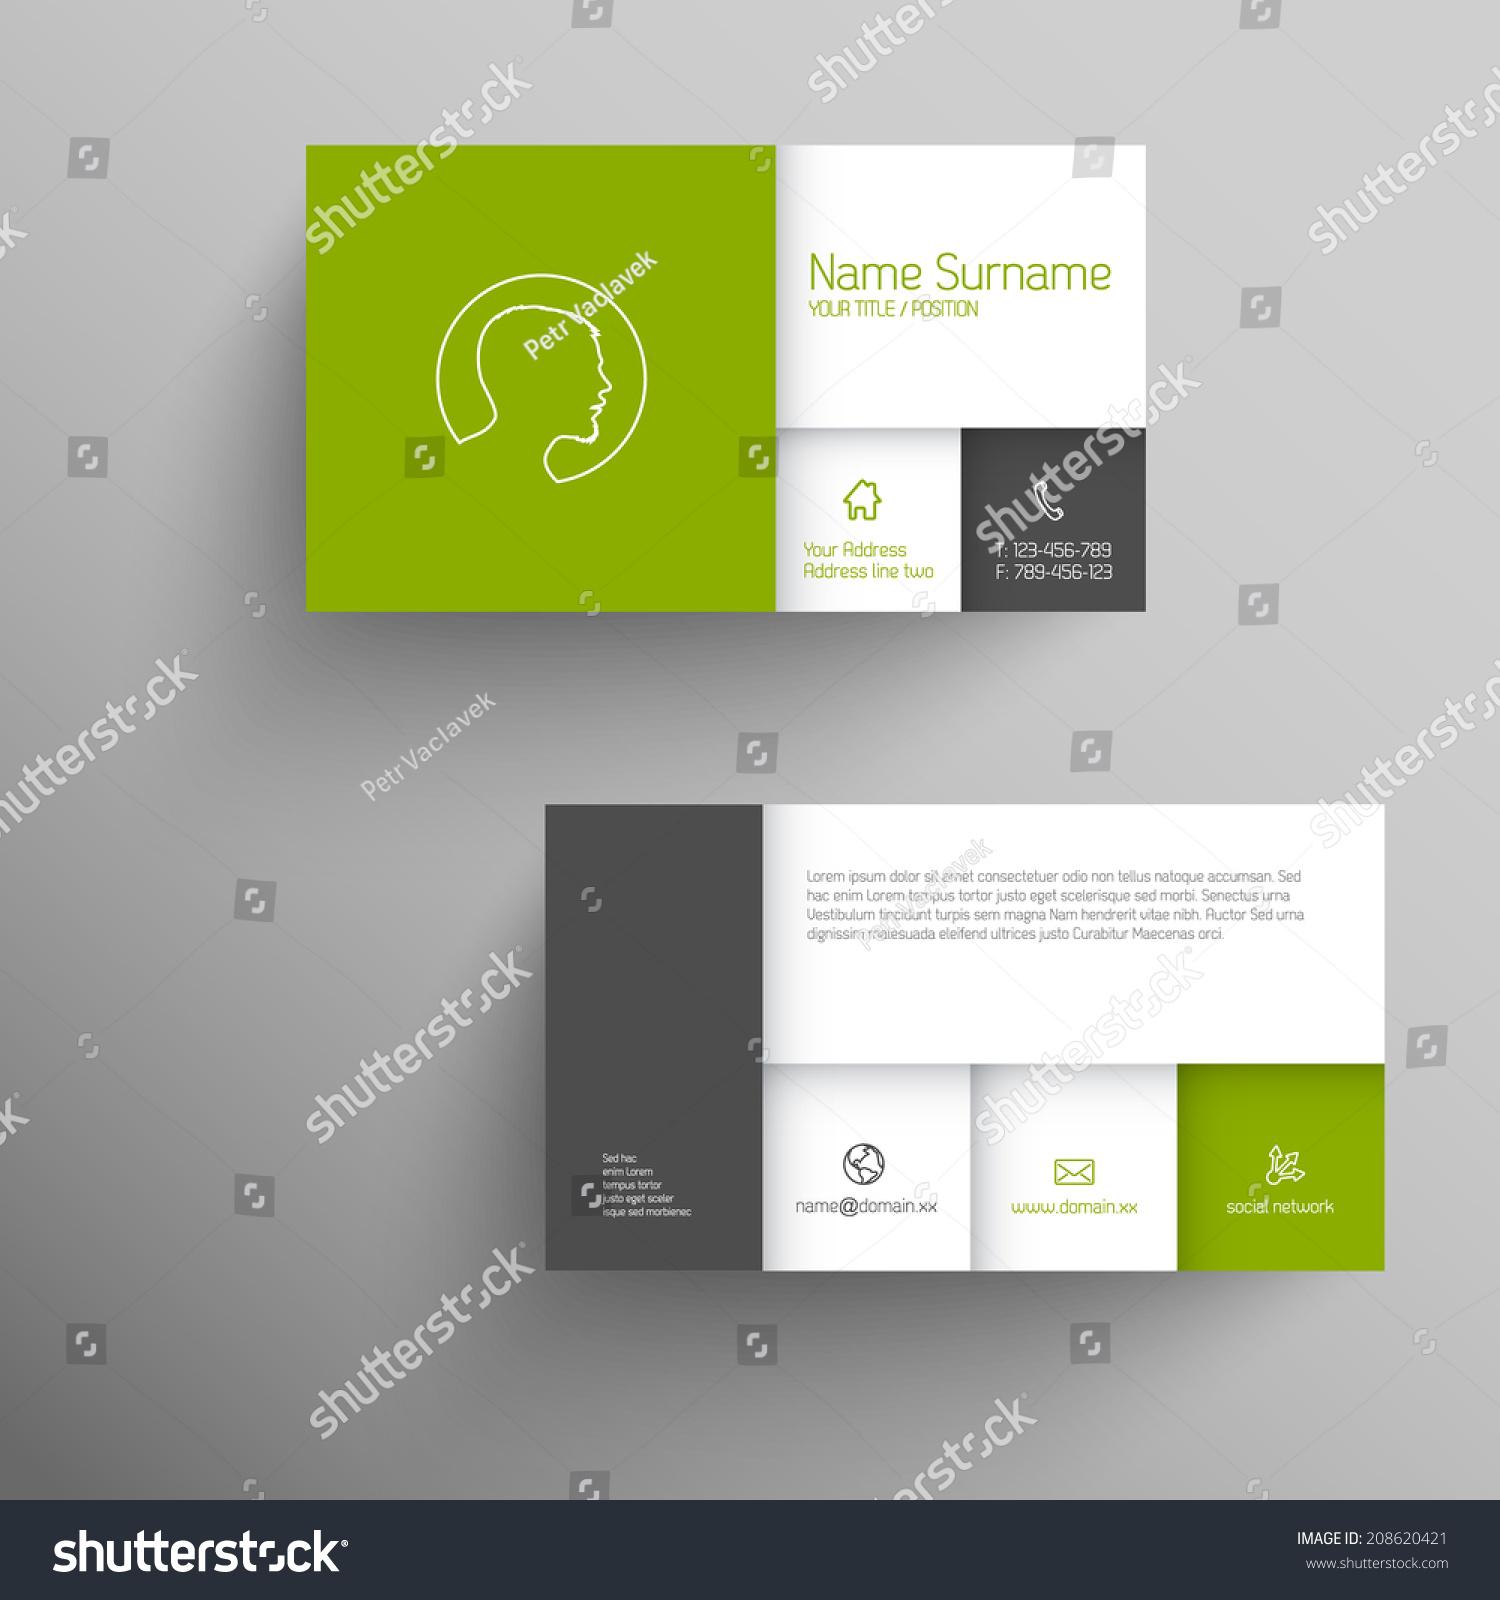 Modern Green Simple Business Card Template Stock Vector - Mobile business card template